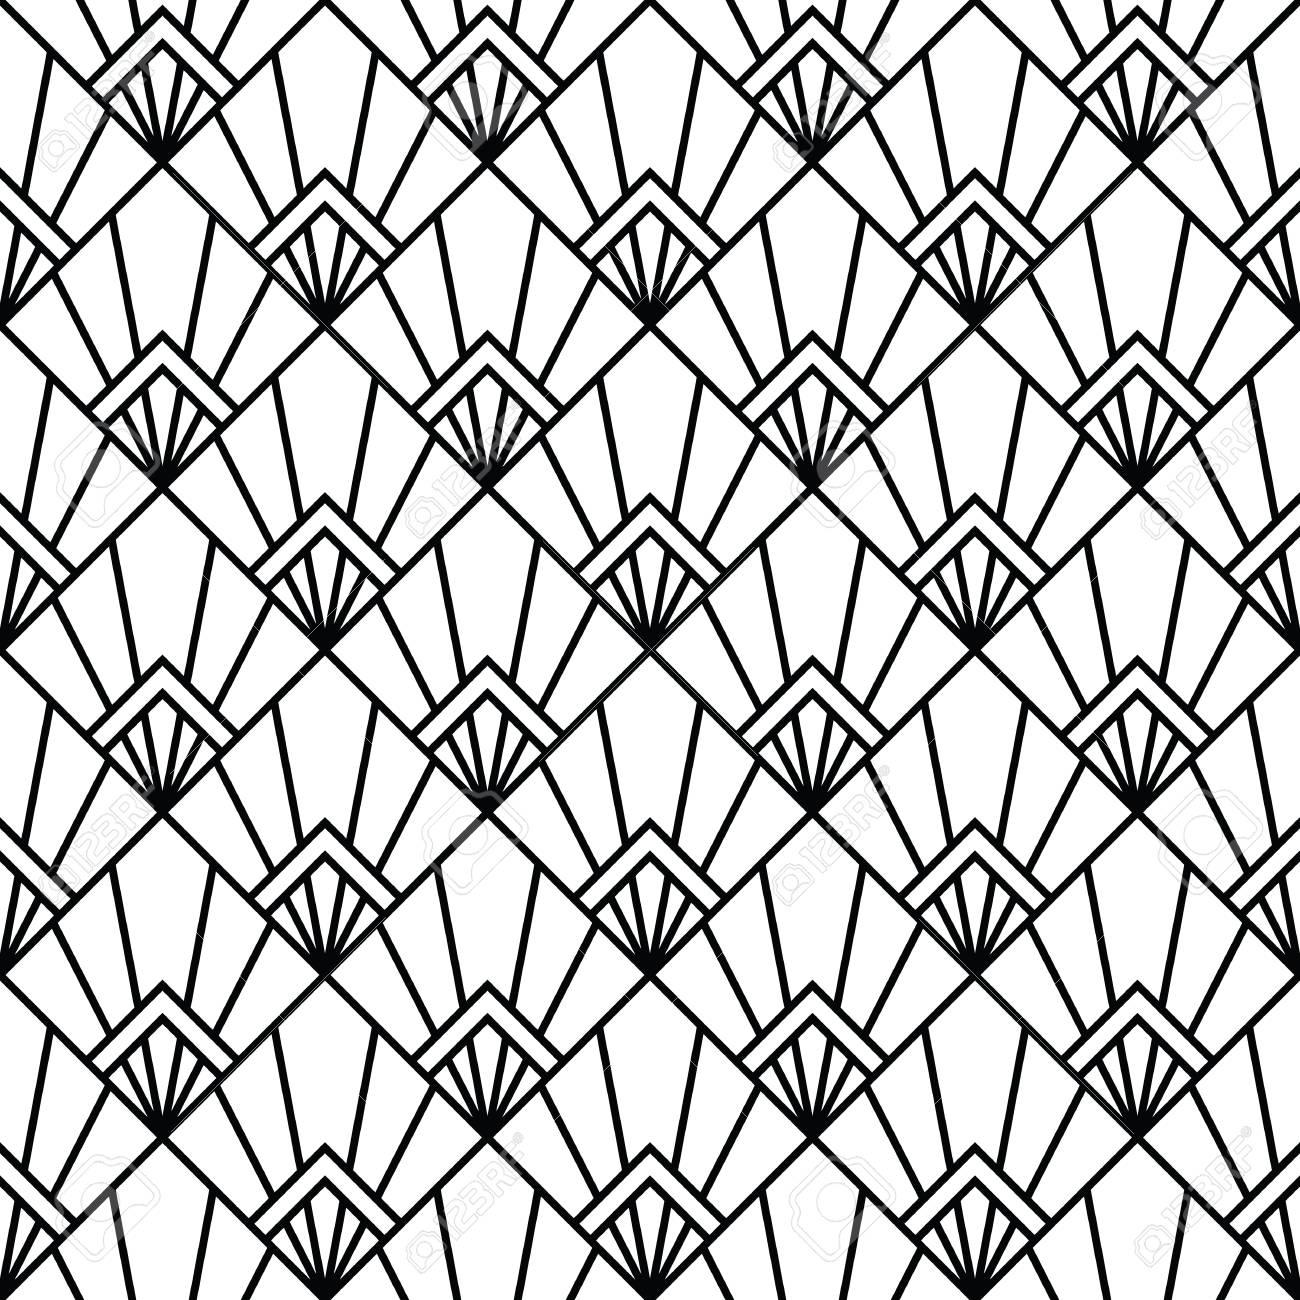 Art Deco Monochrome Arabic Black And White Wallpaper Royalty Free